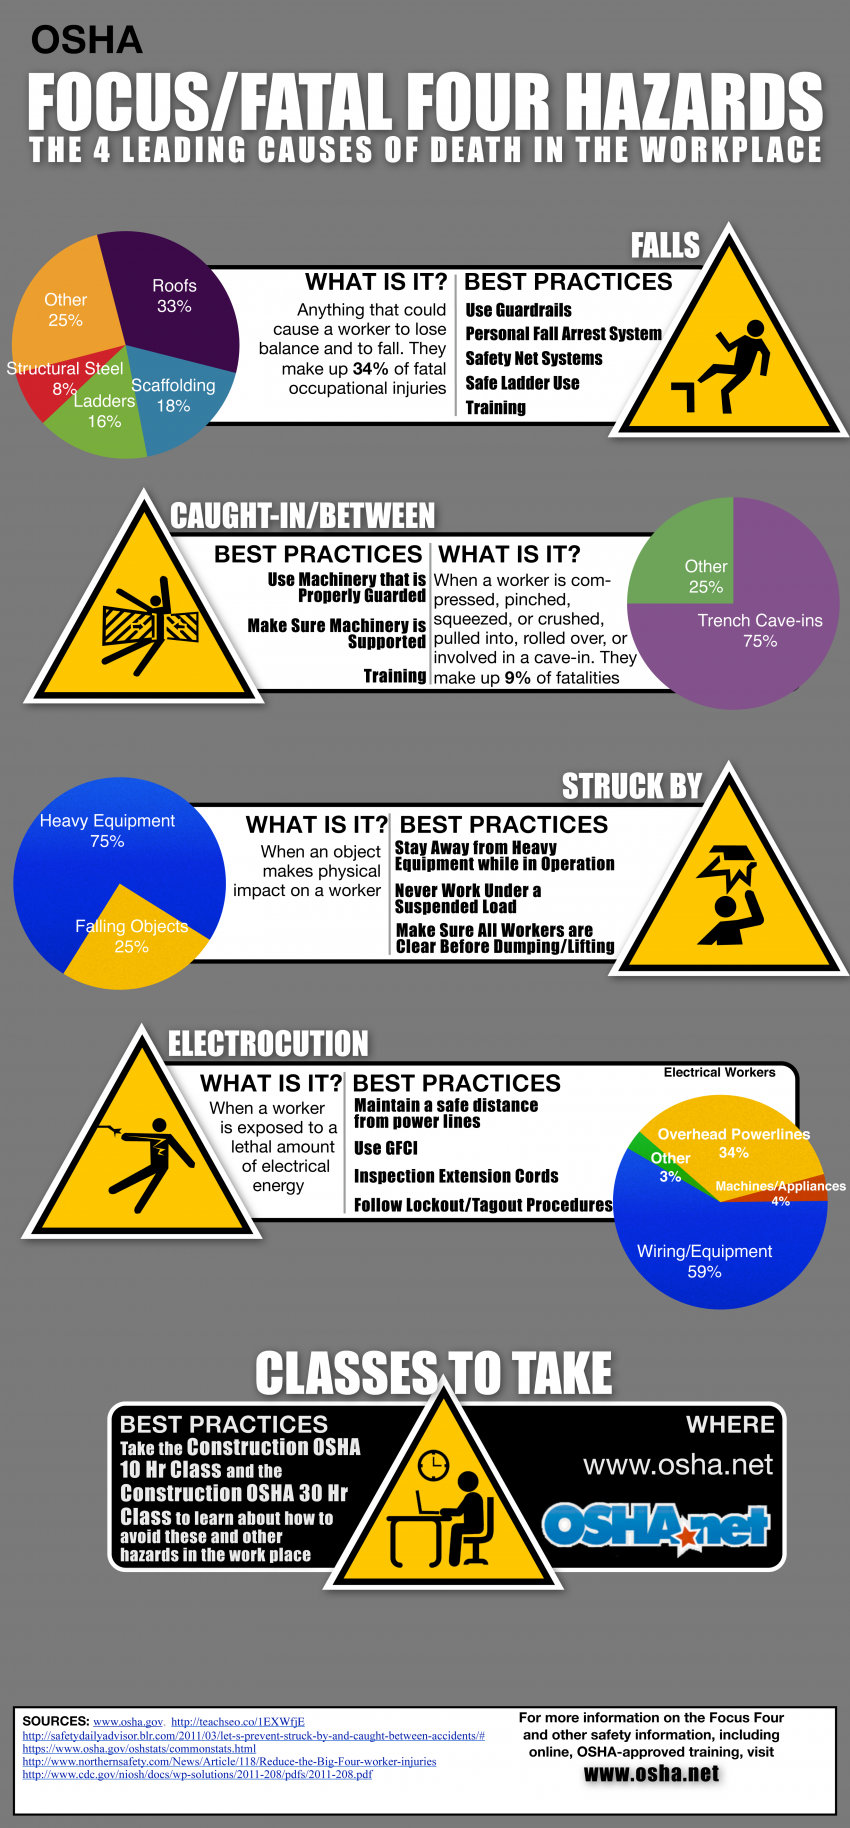 Avoid the osha focus four hazards infographic osha safety hazards avoid the osha focus four hazards infographic osha safety hazards publicscrutiny Choice Image